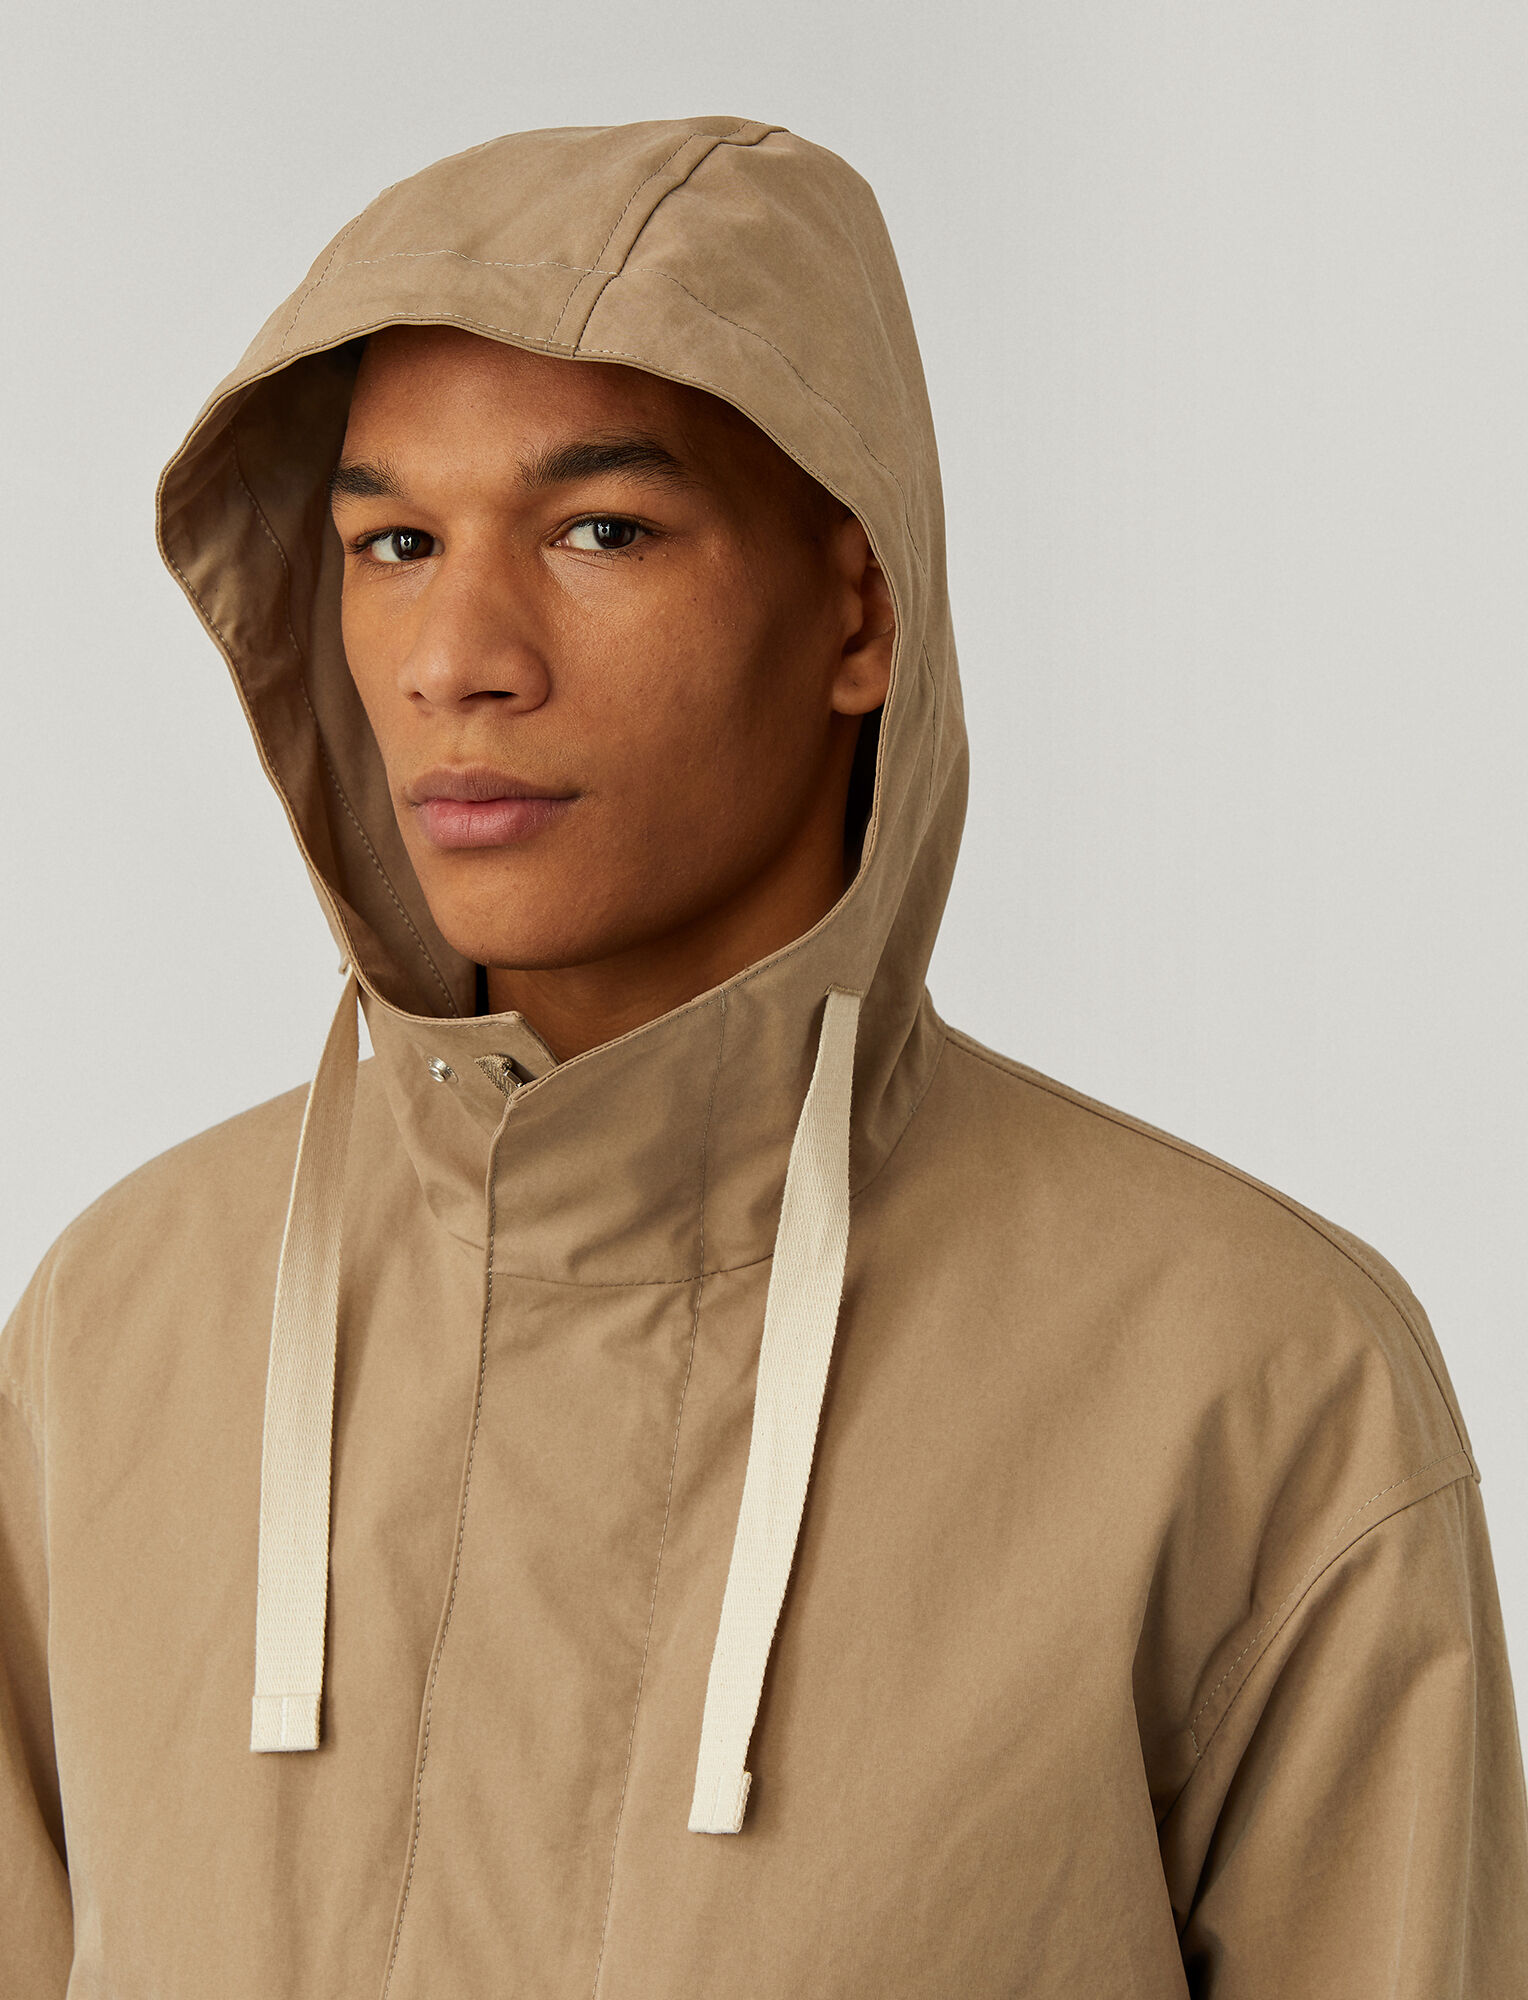 Joseph, Suback Lobos Jacket, in BEIGE